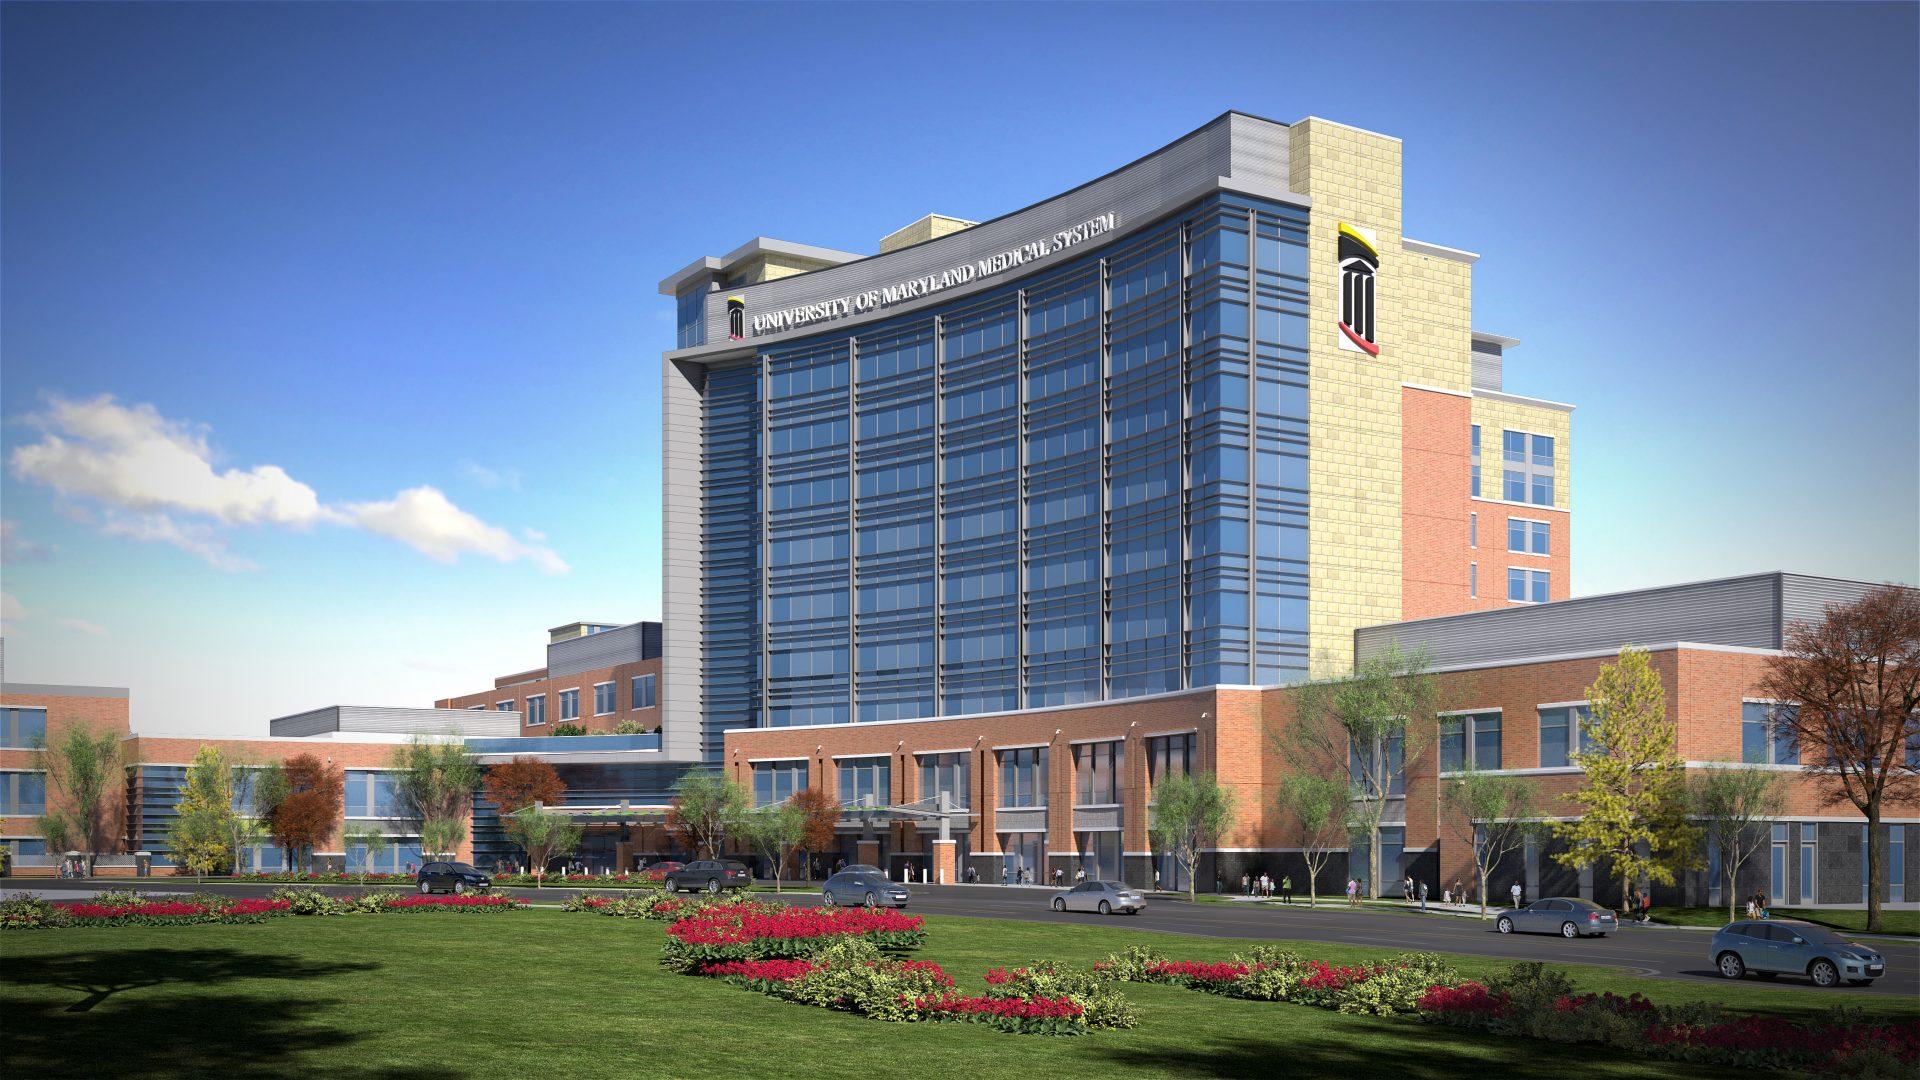 Prince George's Regional Medical Center